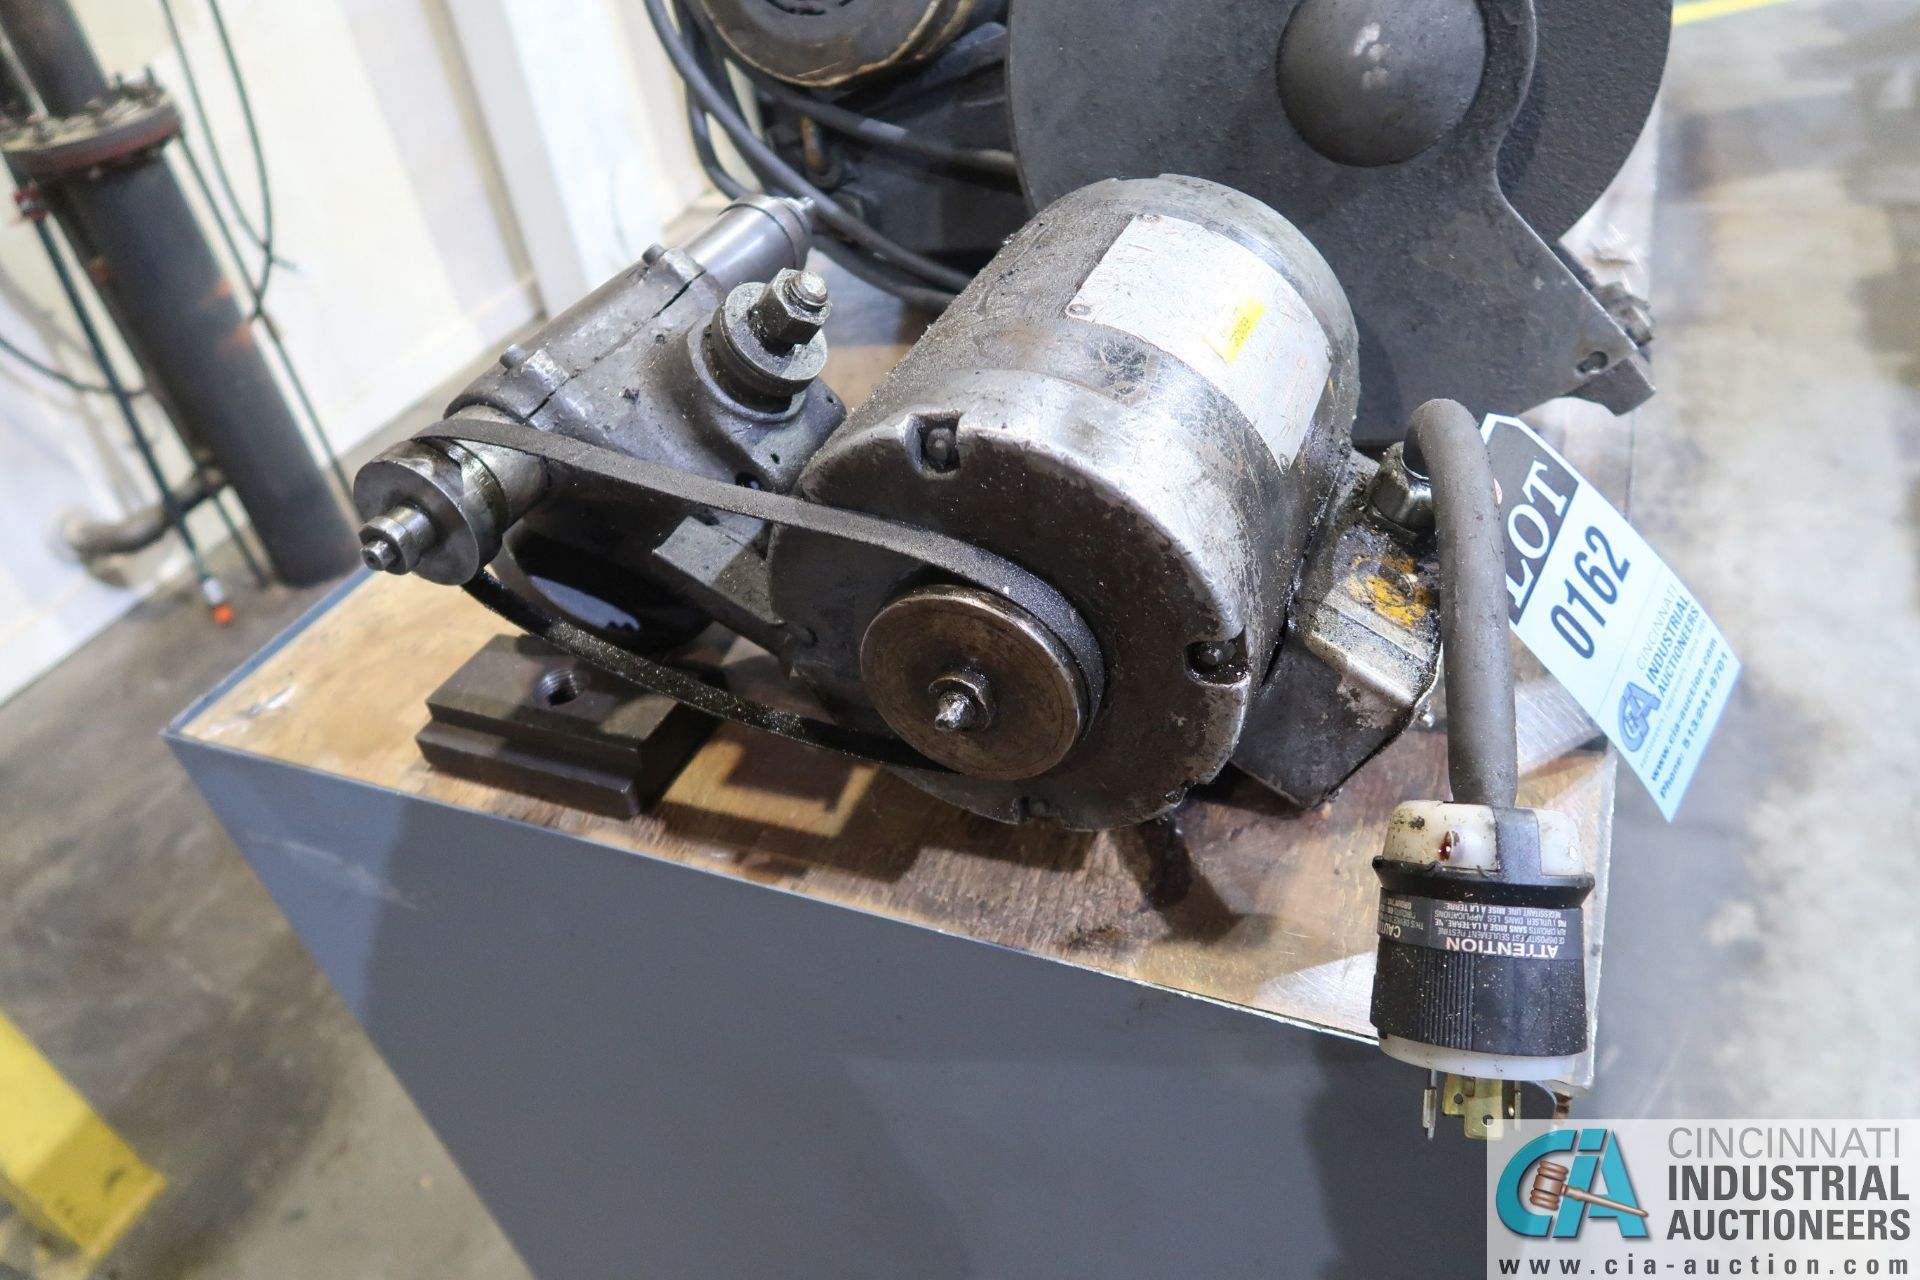 DUNMORE CAT NO. 57-022 TOOL POST GRINDER